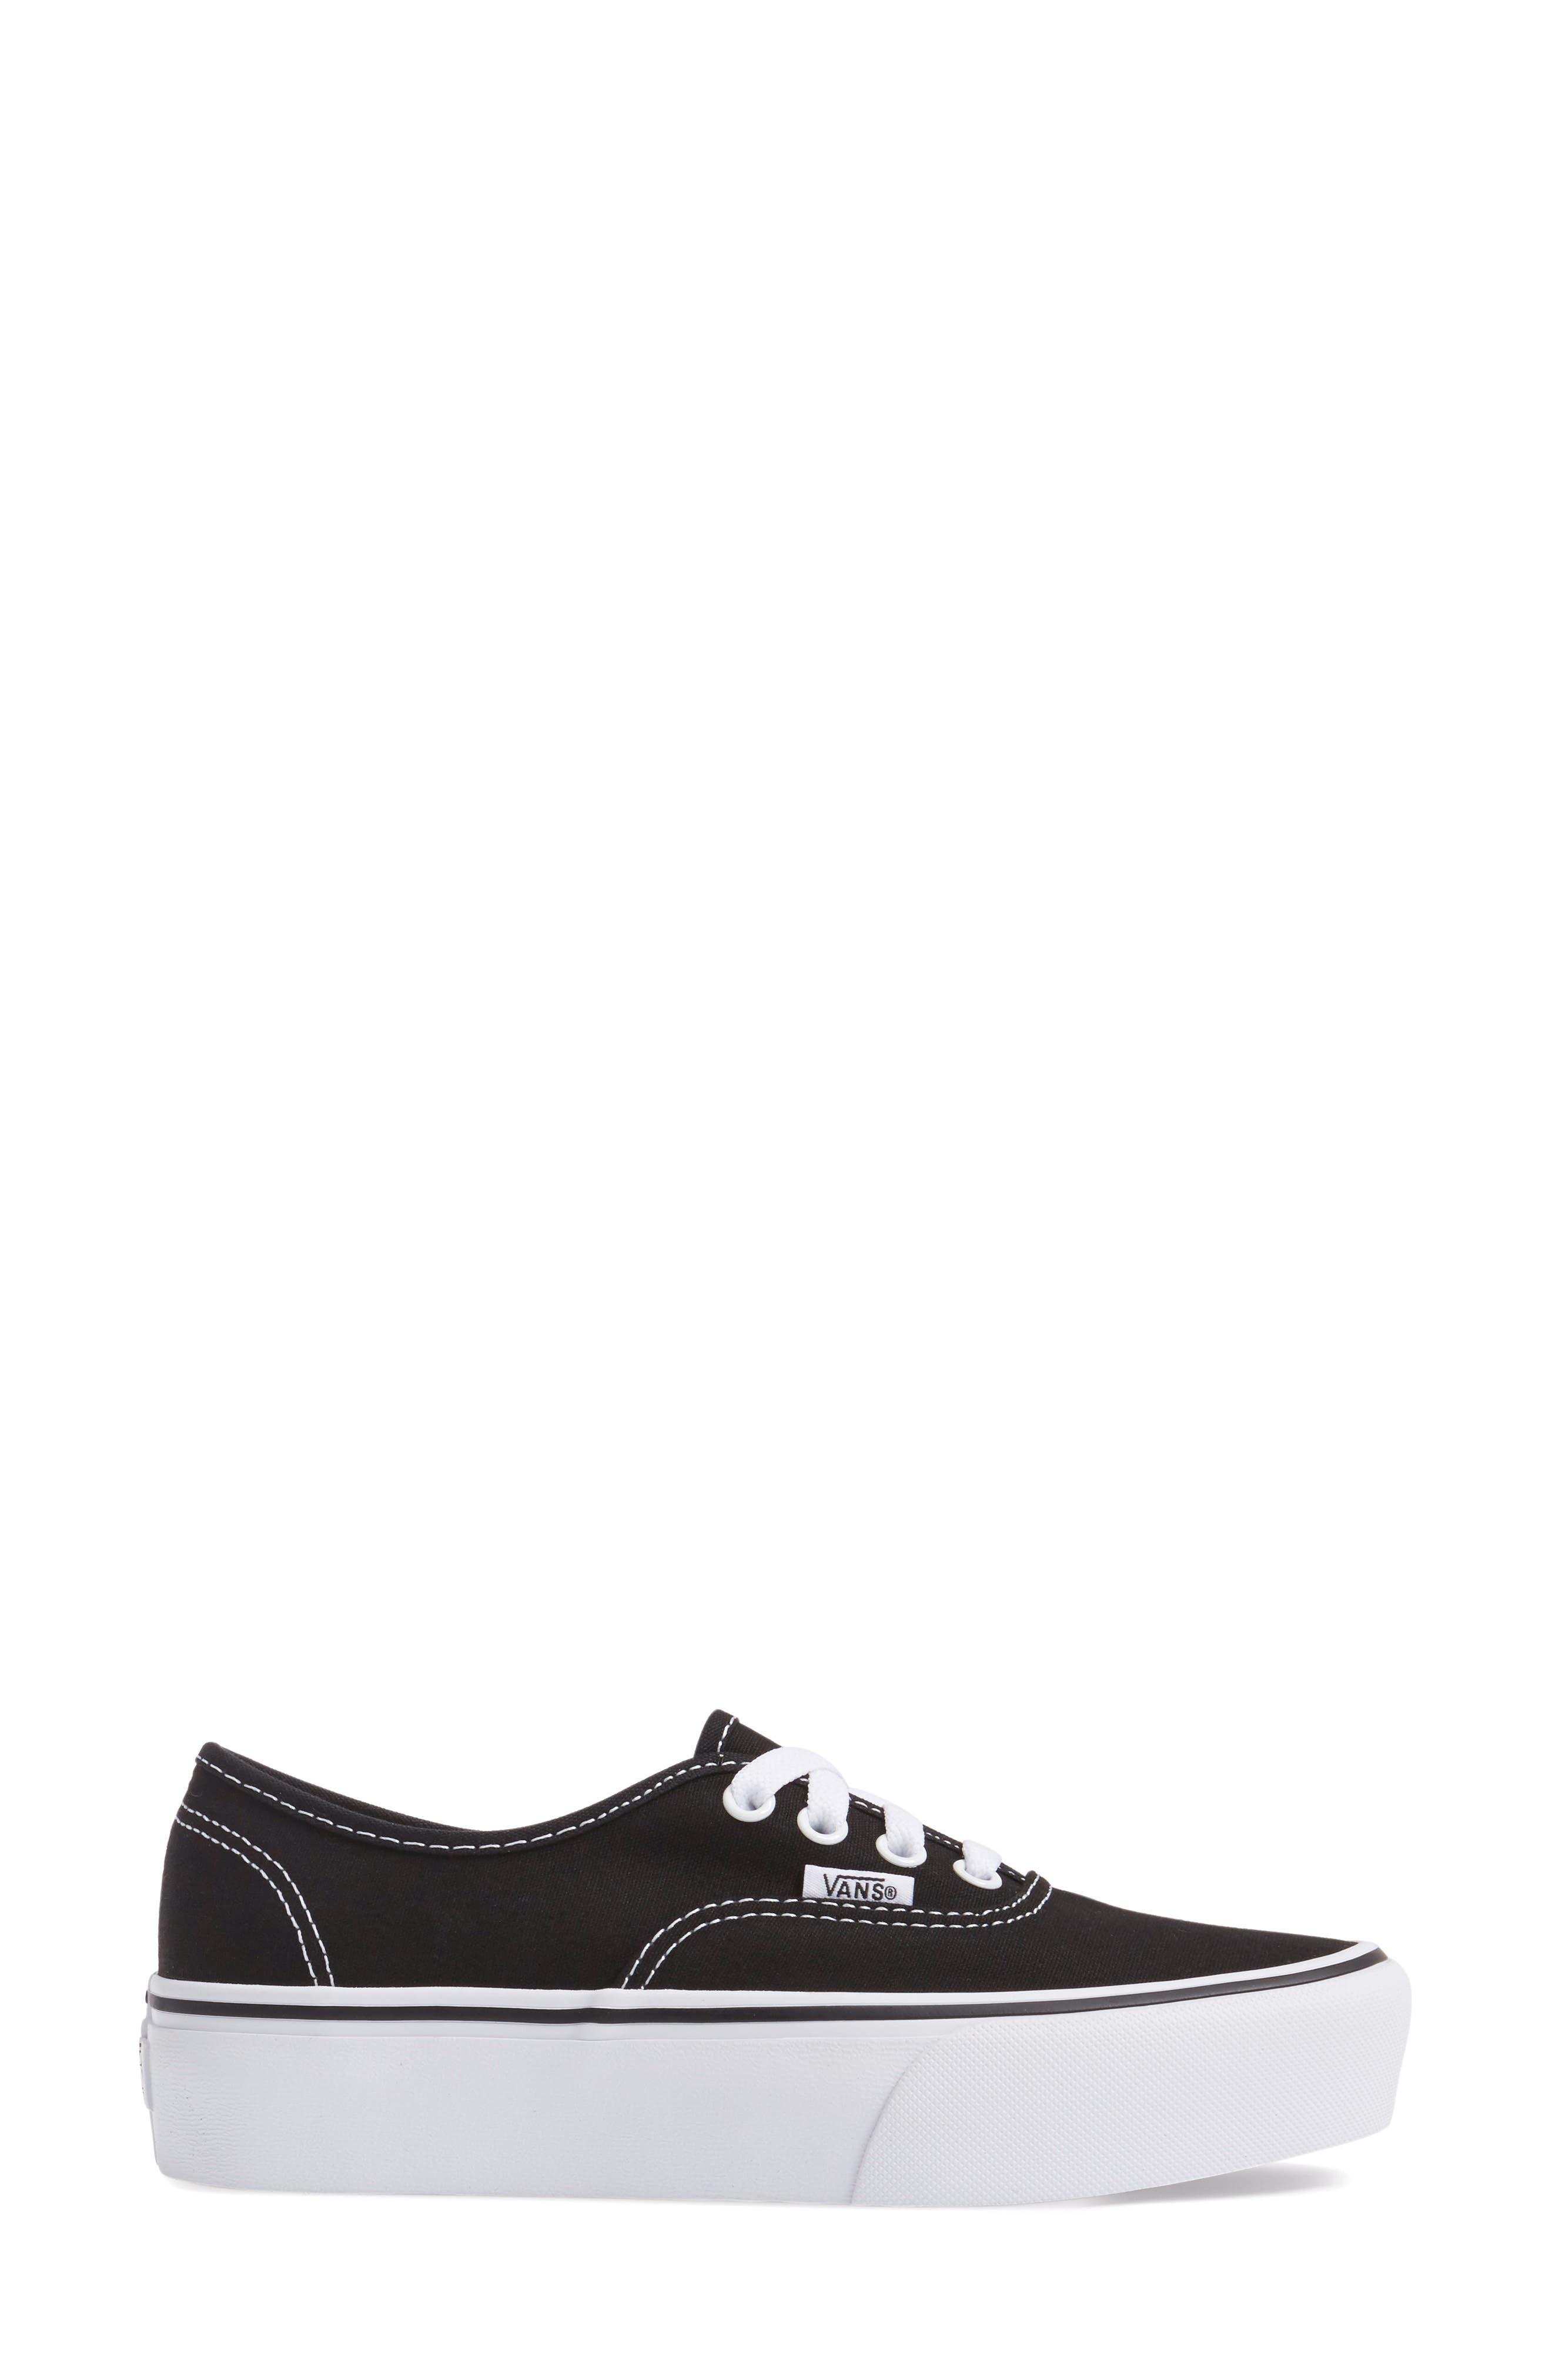 VANS, 'Authentic' Platform Sneaker, Alternate thumbnail 3, color, BLACK/ WHITE